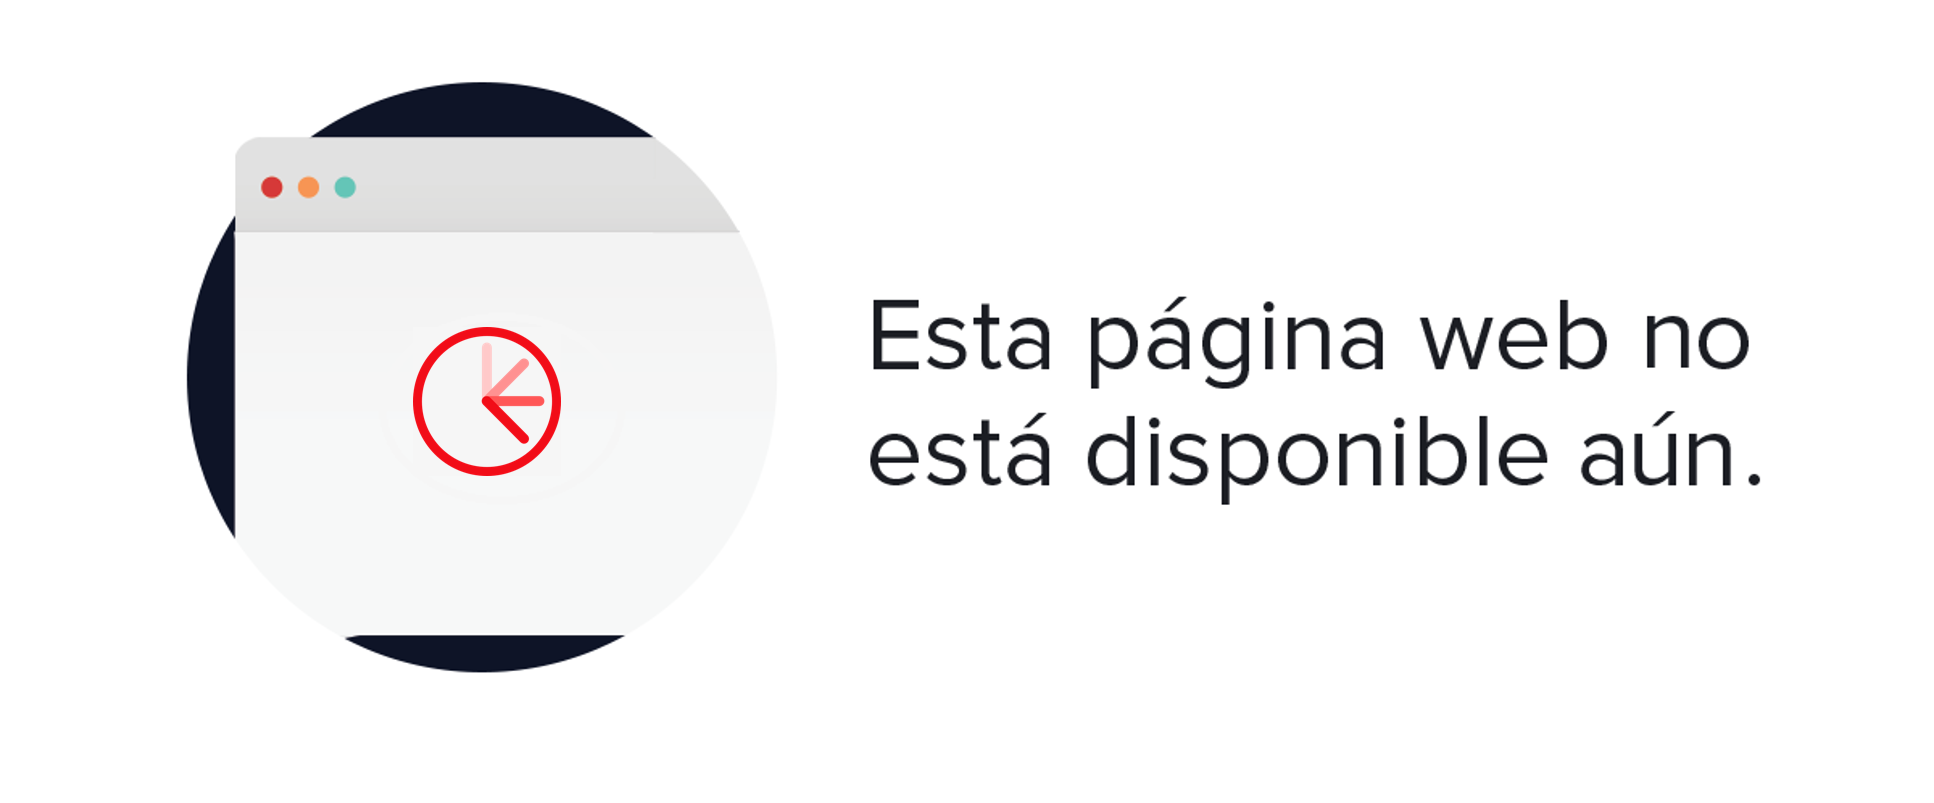 Roberto Verino - Falda lápiz de mujer Roberto Verino con pata de gallo Beige 001024862202181038 - KFCXEER